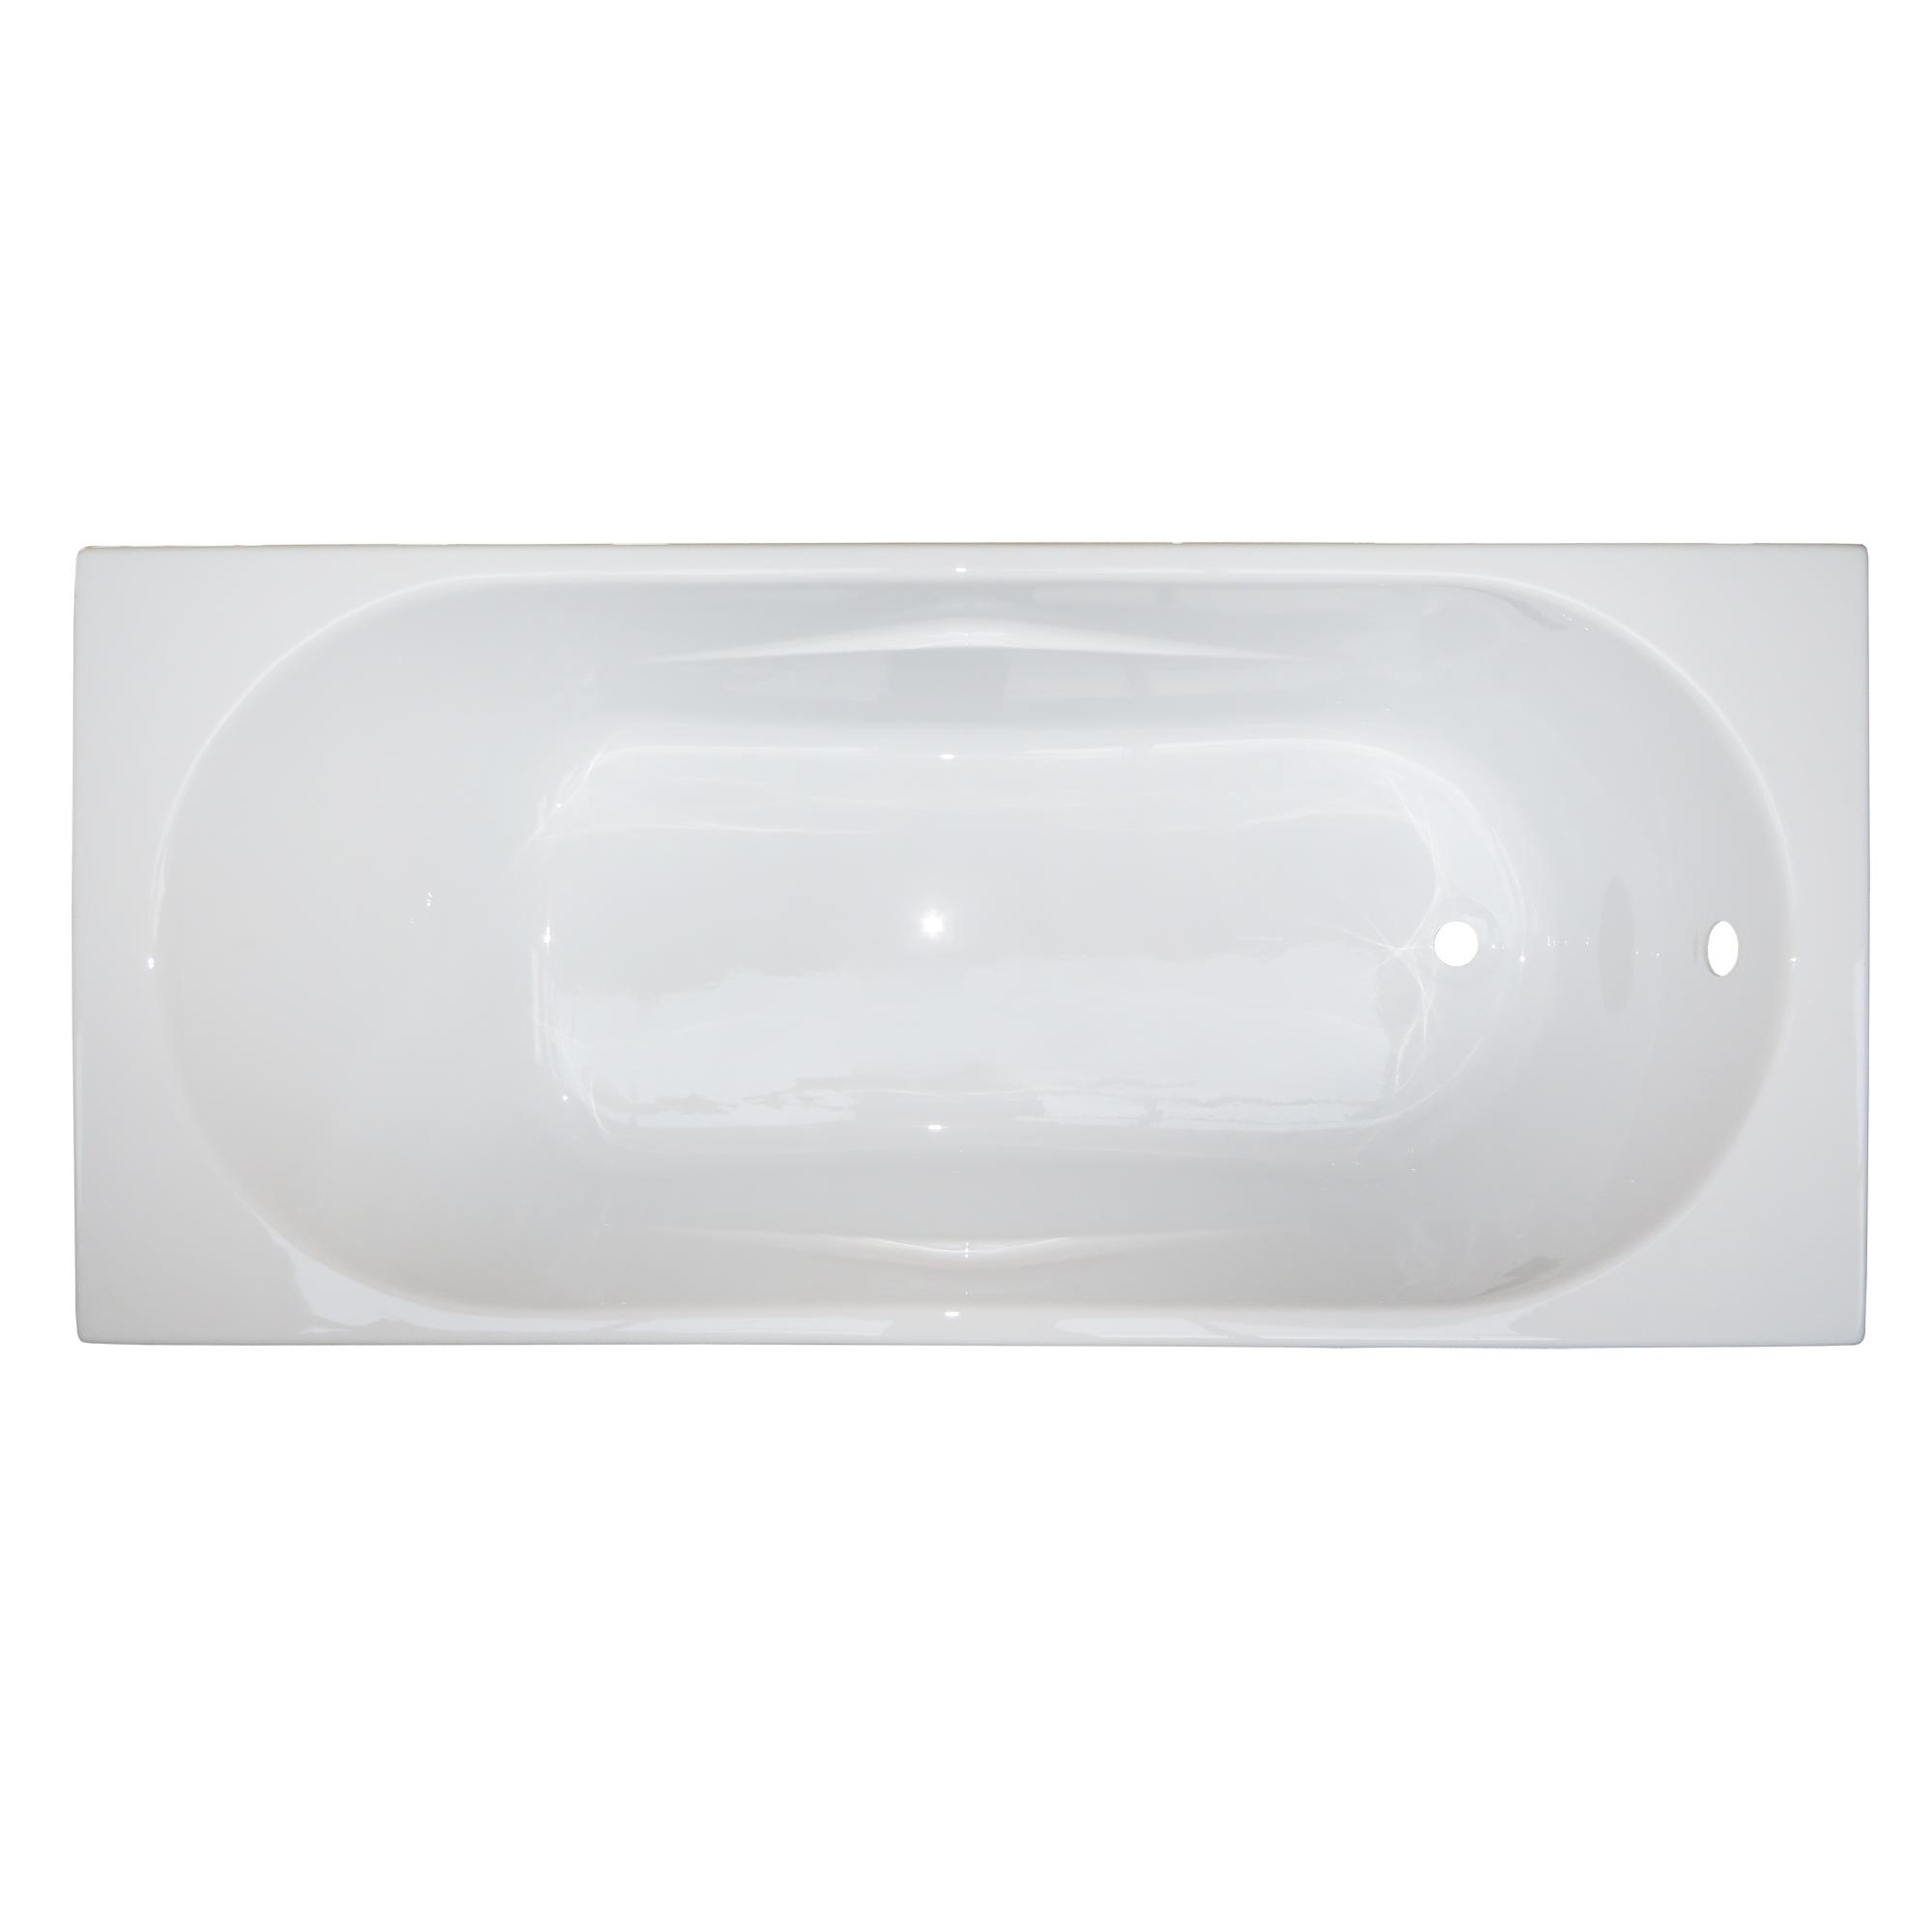 Акриловая ванна Royal bath Tudor RB407702 160х70 tudor аккумулятор tudor high tech 77ач обратная полярность ta770